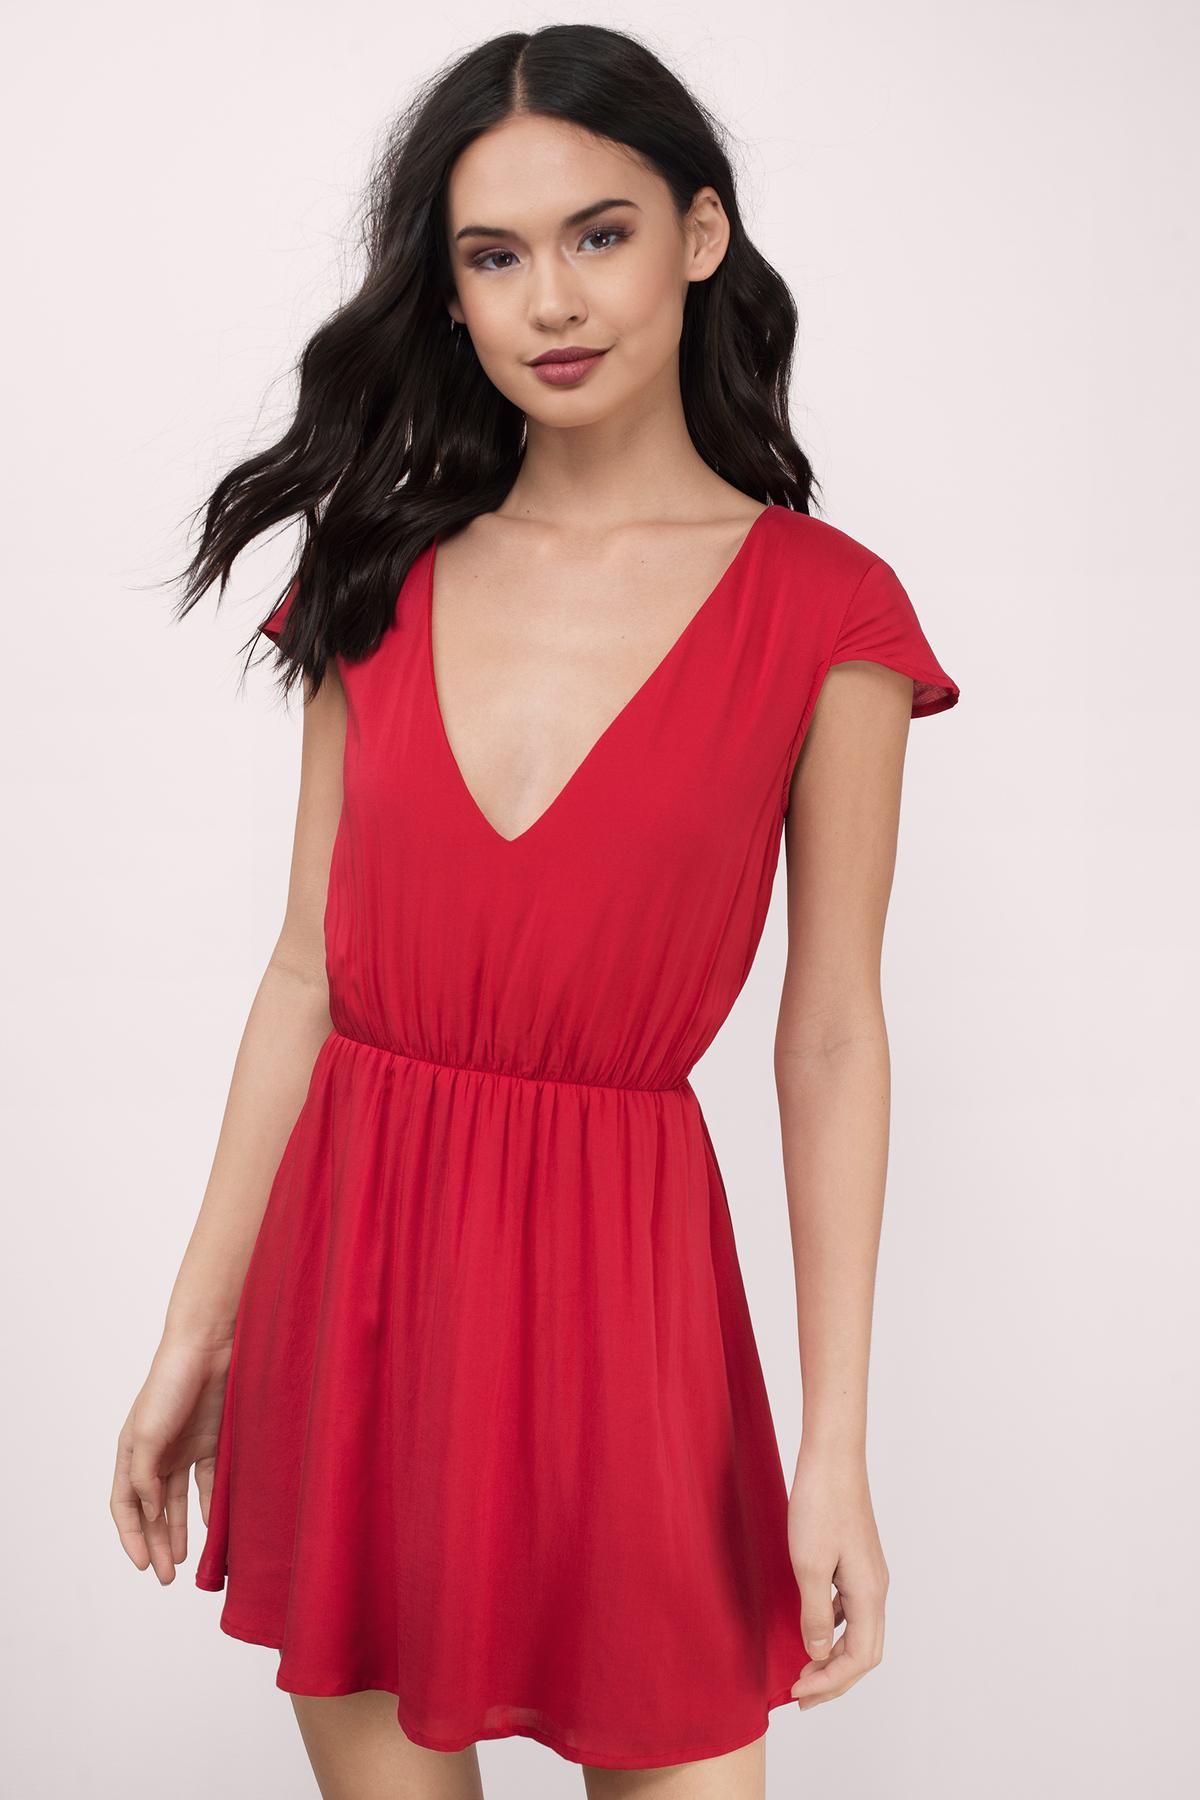 Sexy Red Skater Dress - Red Dress - V Neck Dress - $10.00